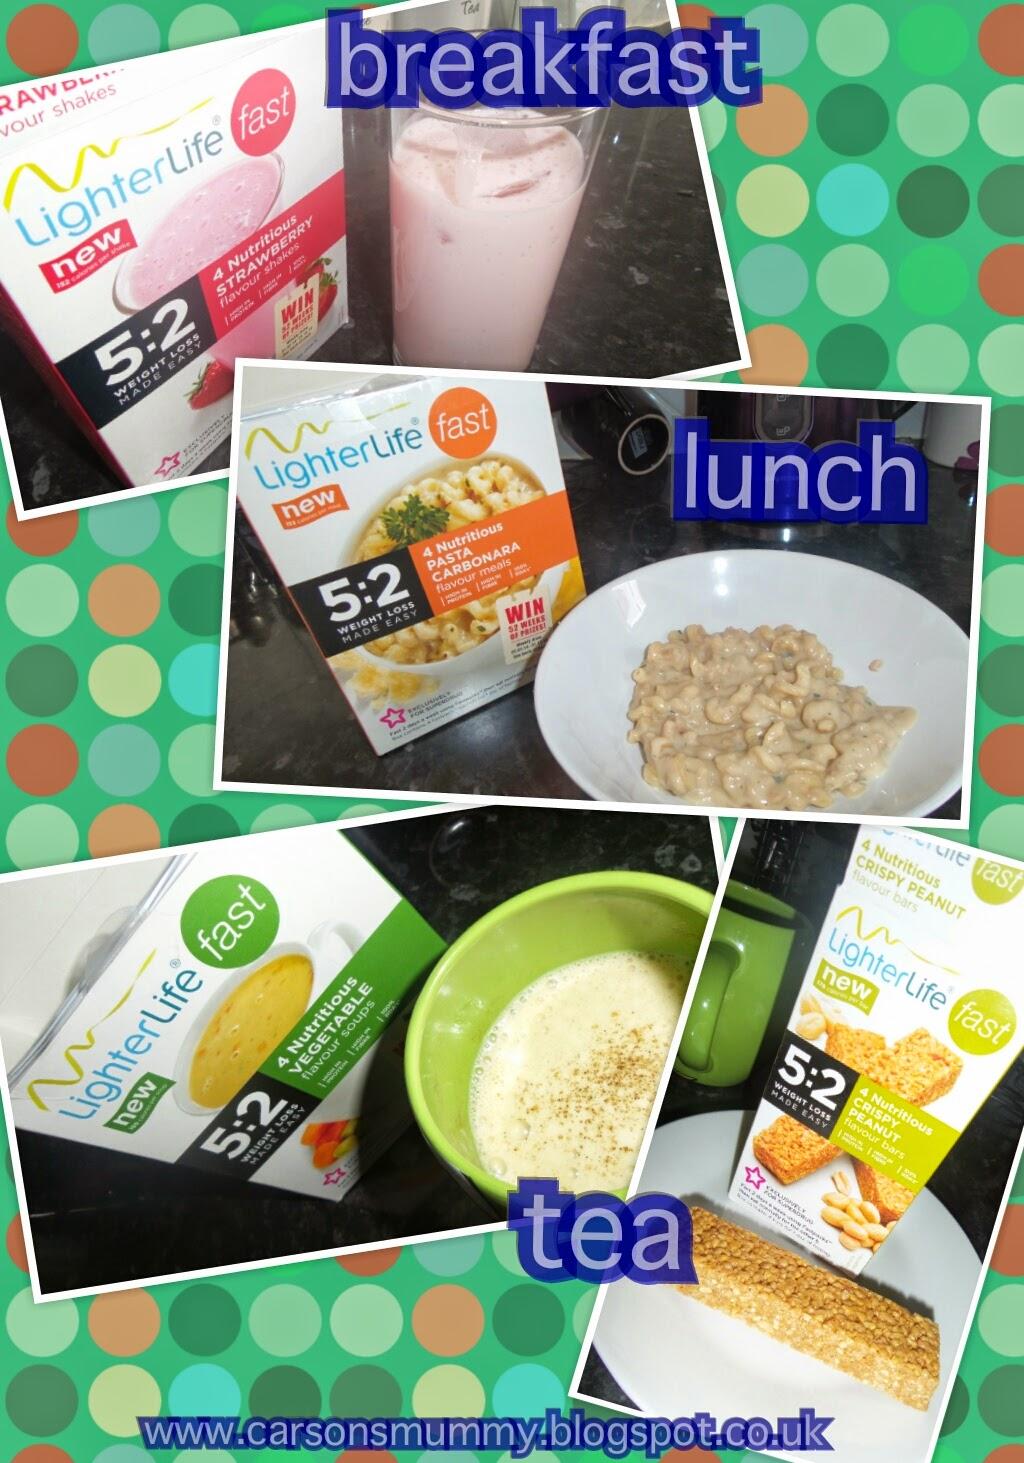 Cholesterol lowering diet meal plan picture 1